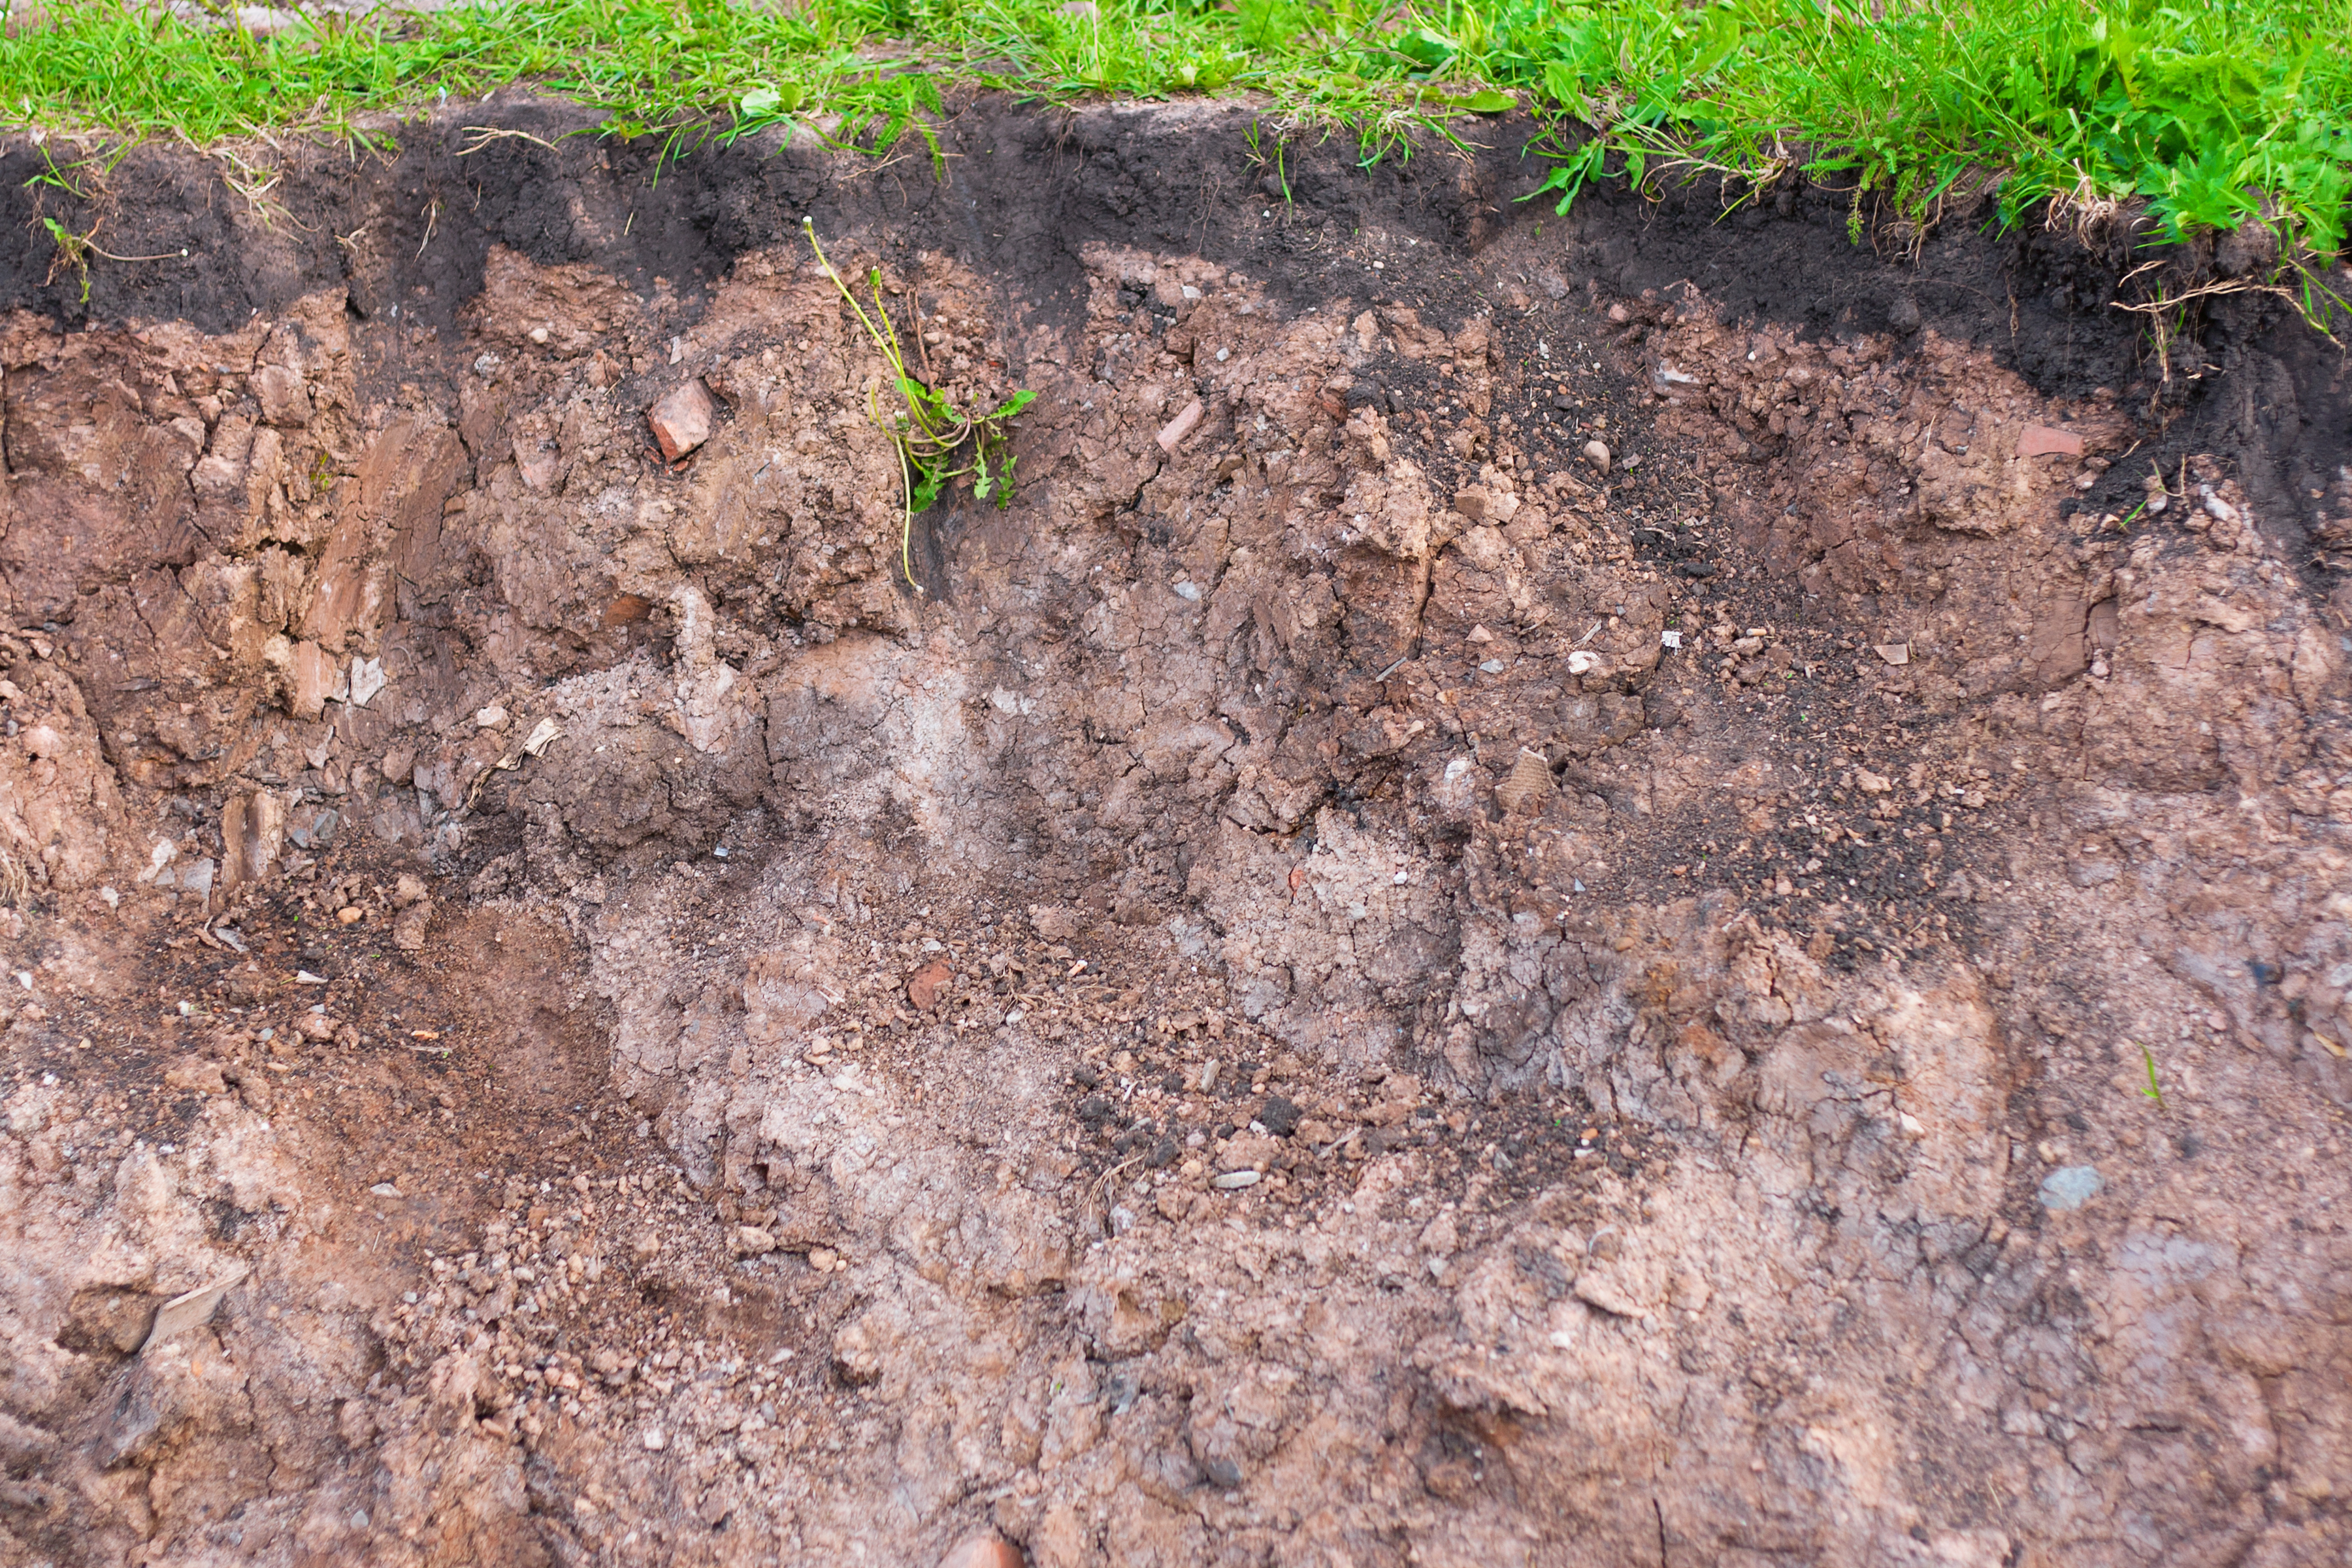 slit of ground, Angle, Light, Stratum, Soil, HQ Photo